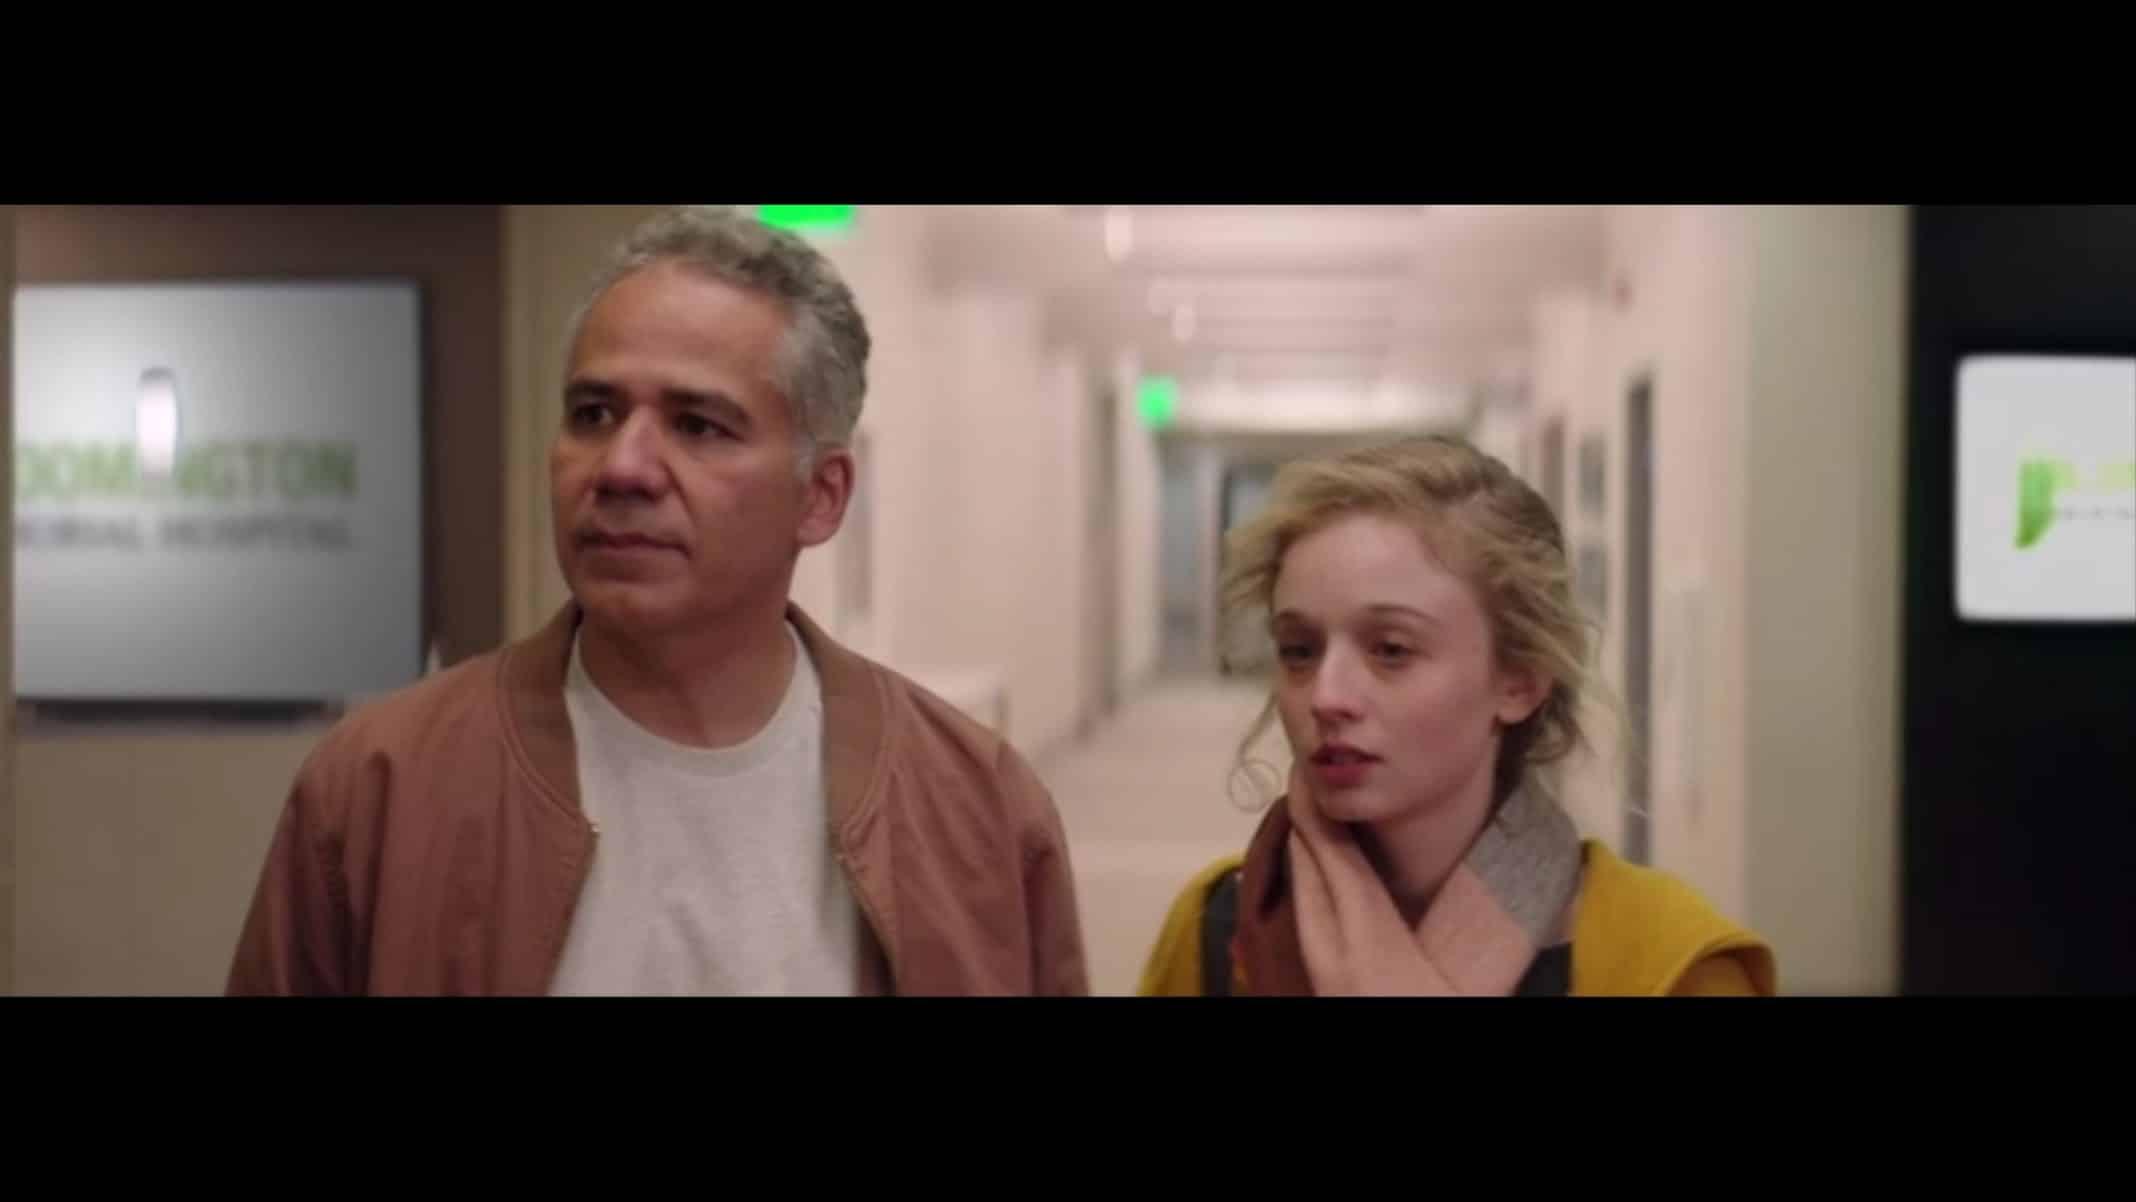 Gary (John Ortiz) and Nora (Carson Meyer) in a hospital.